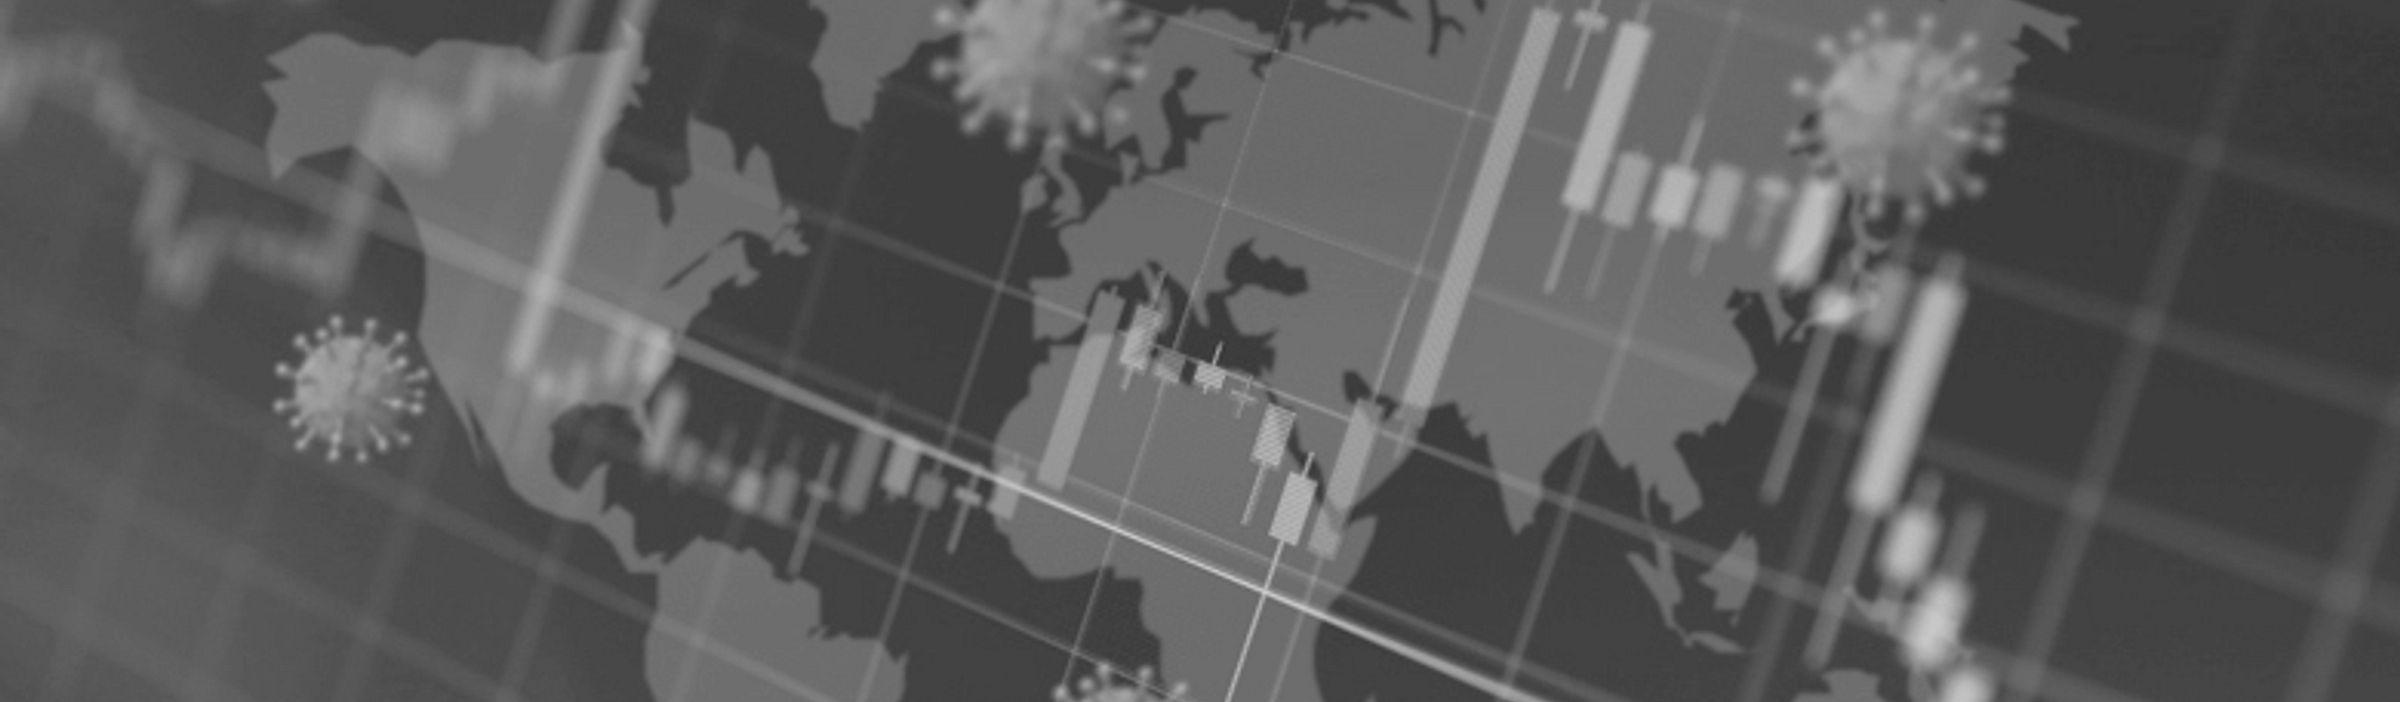 Global pandemic and economic impact map